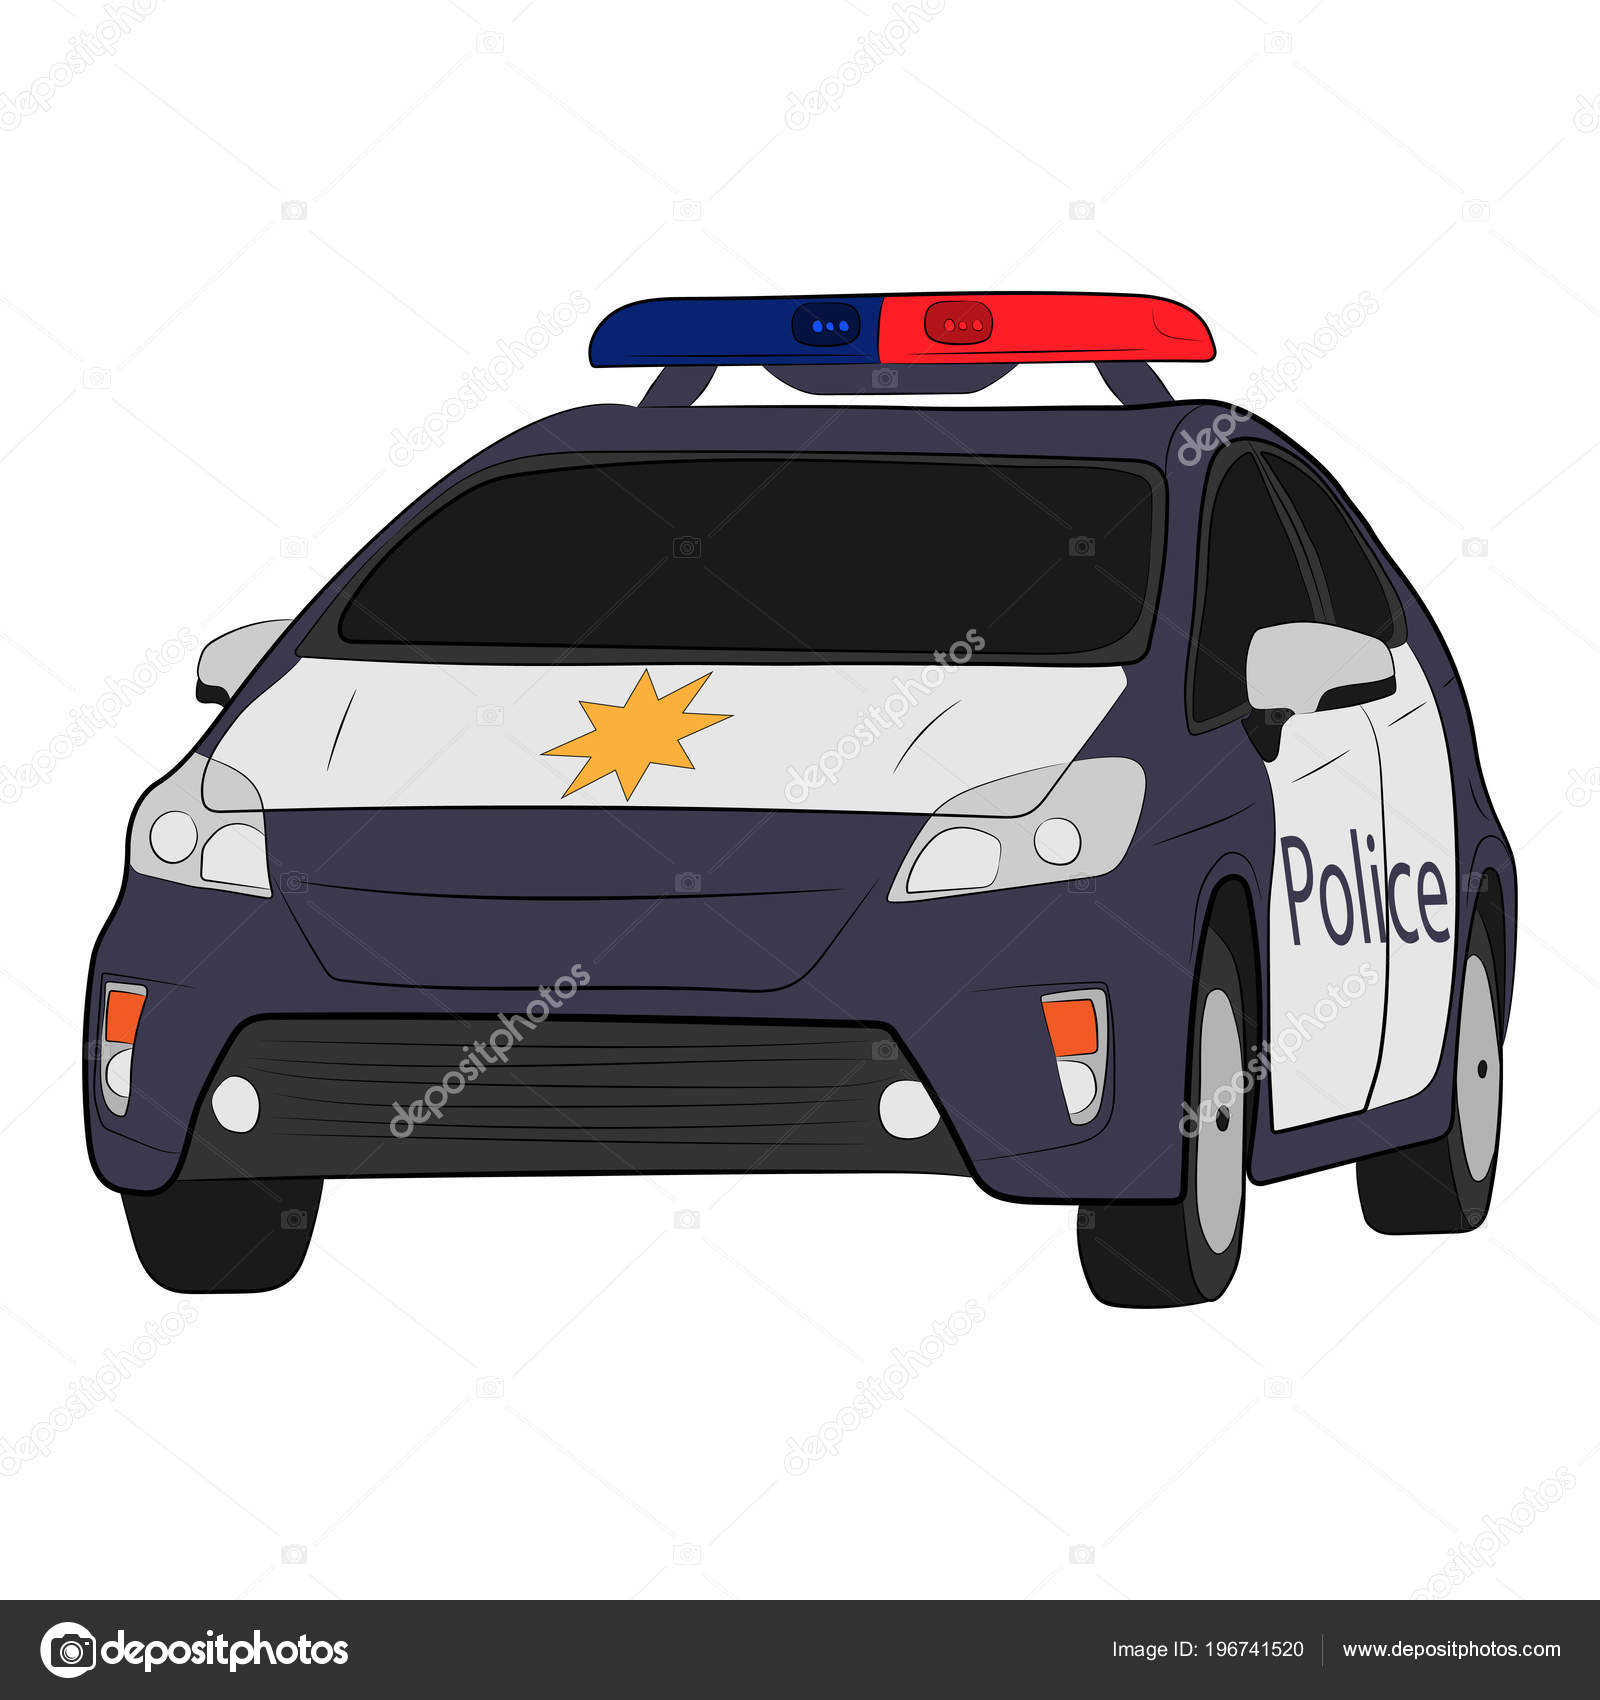 Police Car Vector Drawing Illustration Stock Vector C V Lab